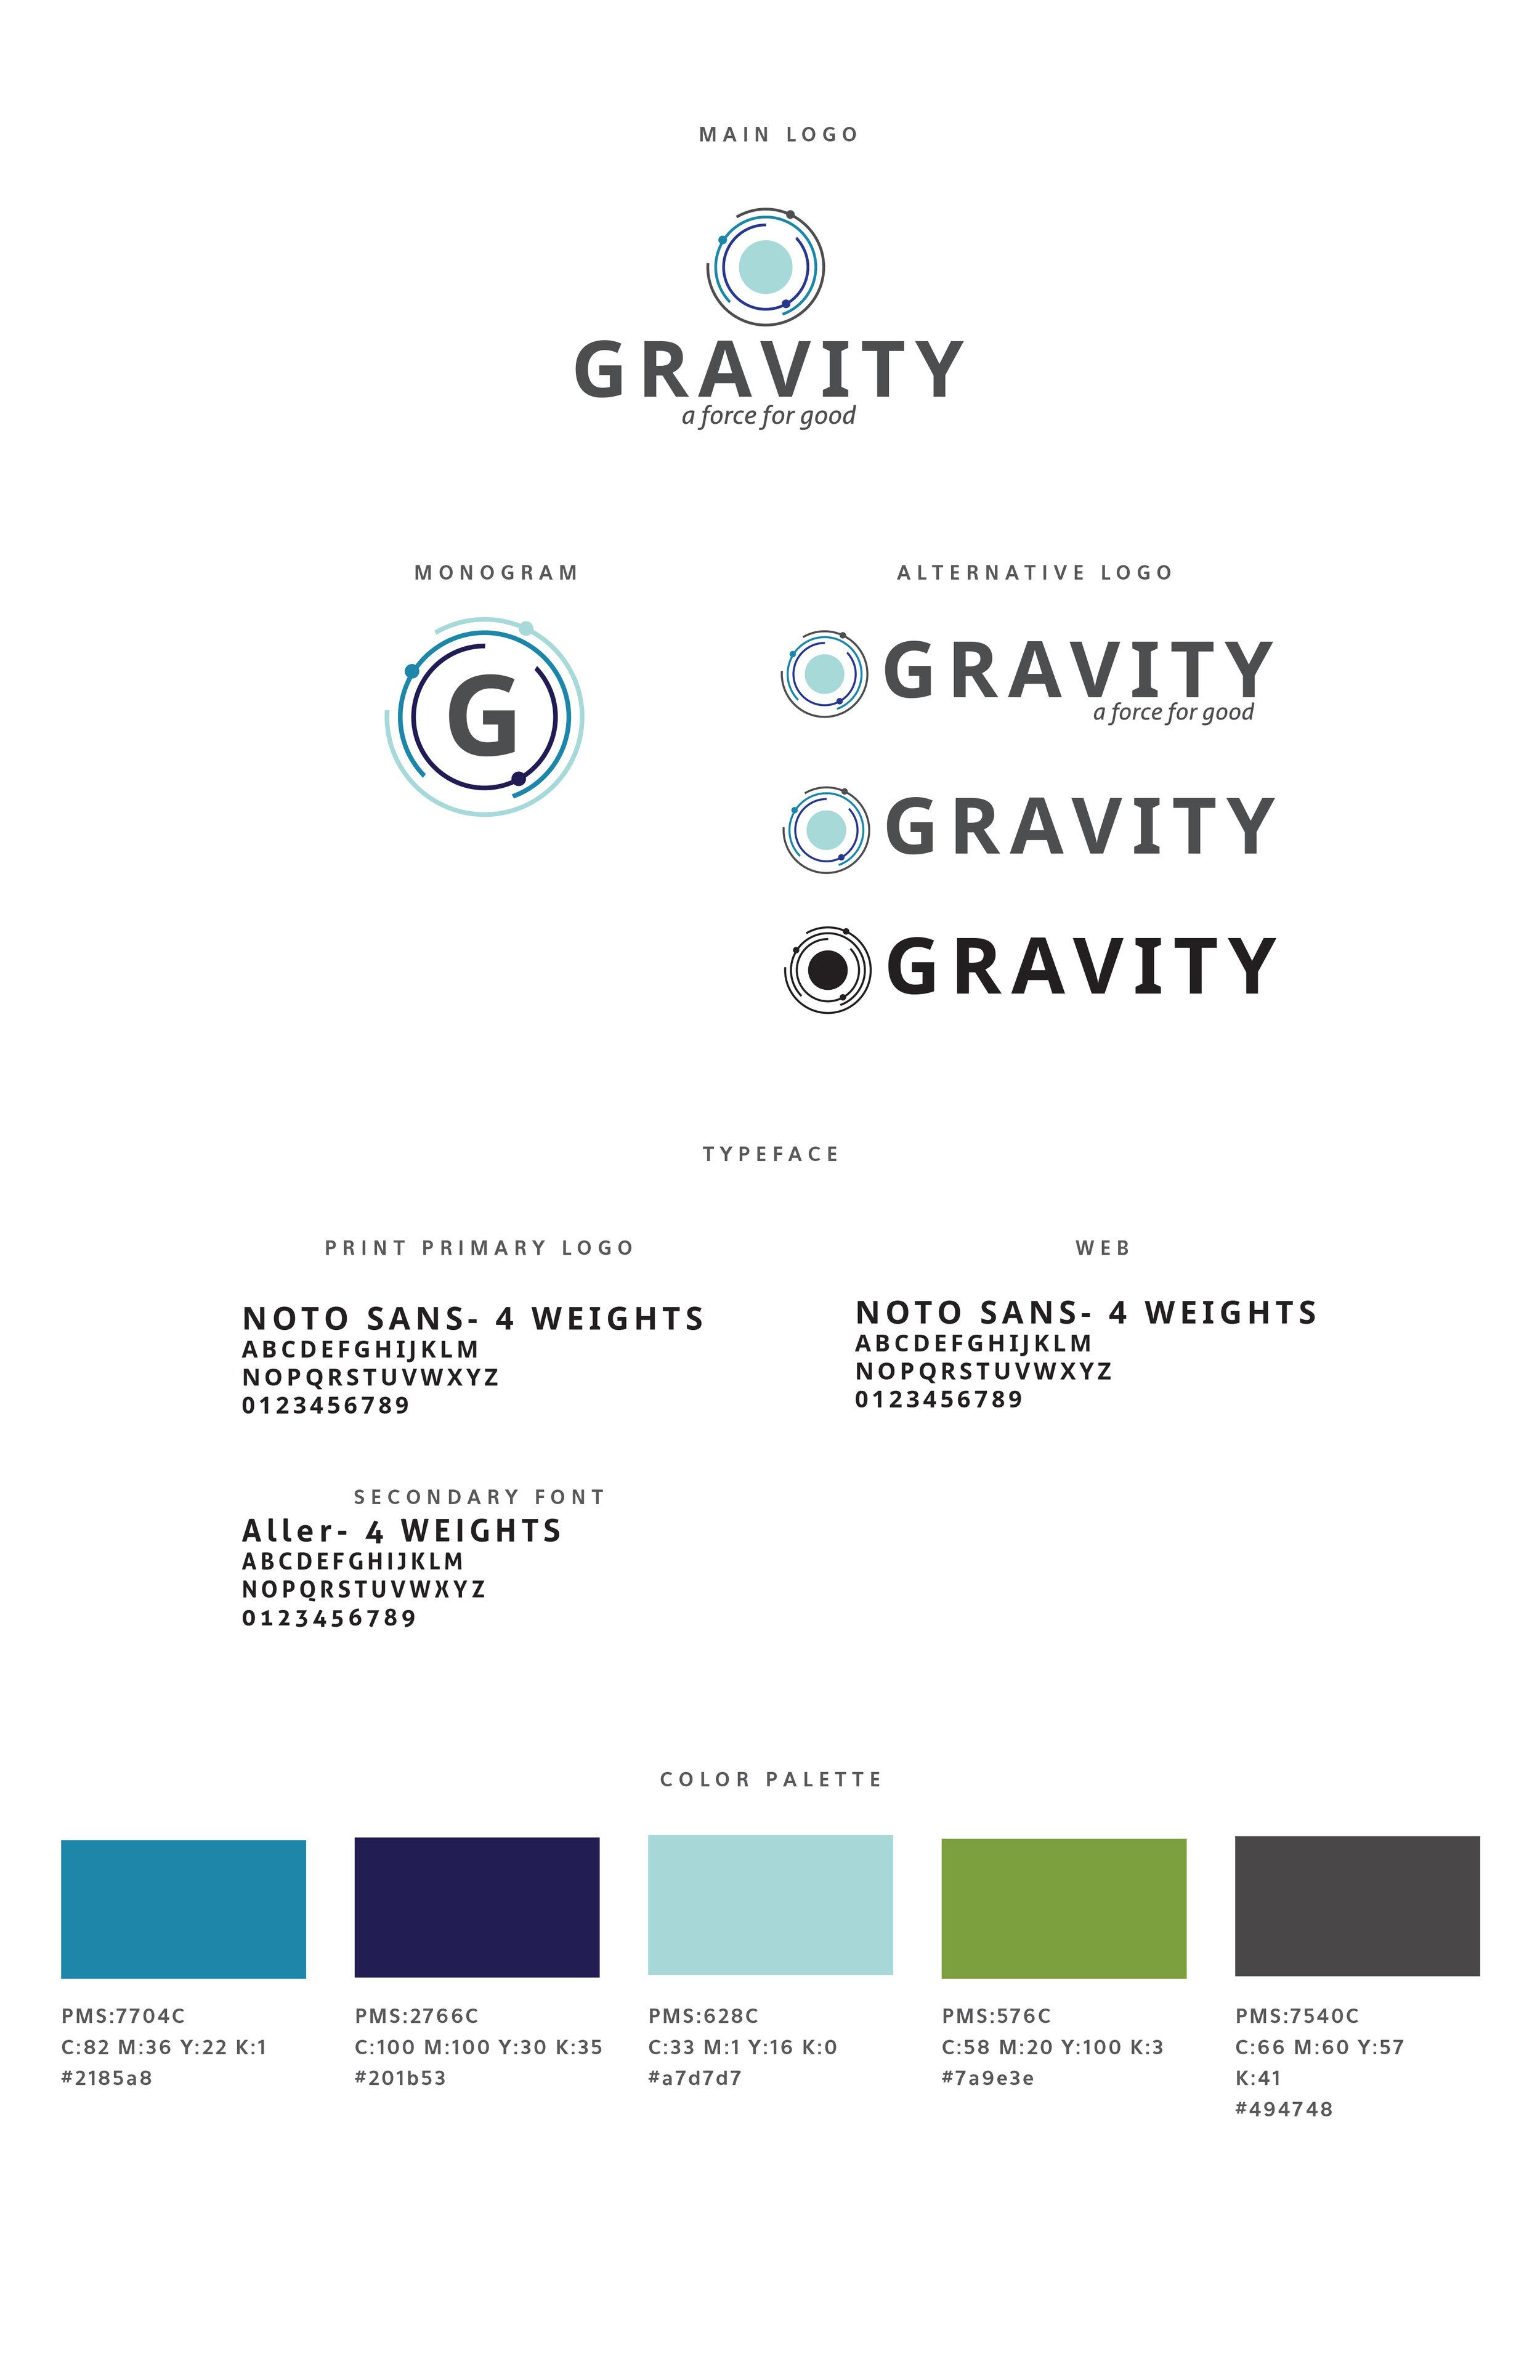 Gravity_logo_brand_sheet.jpg